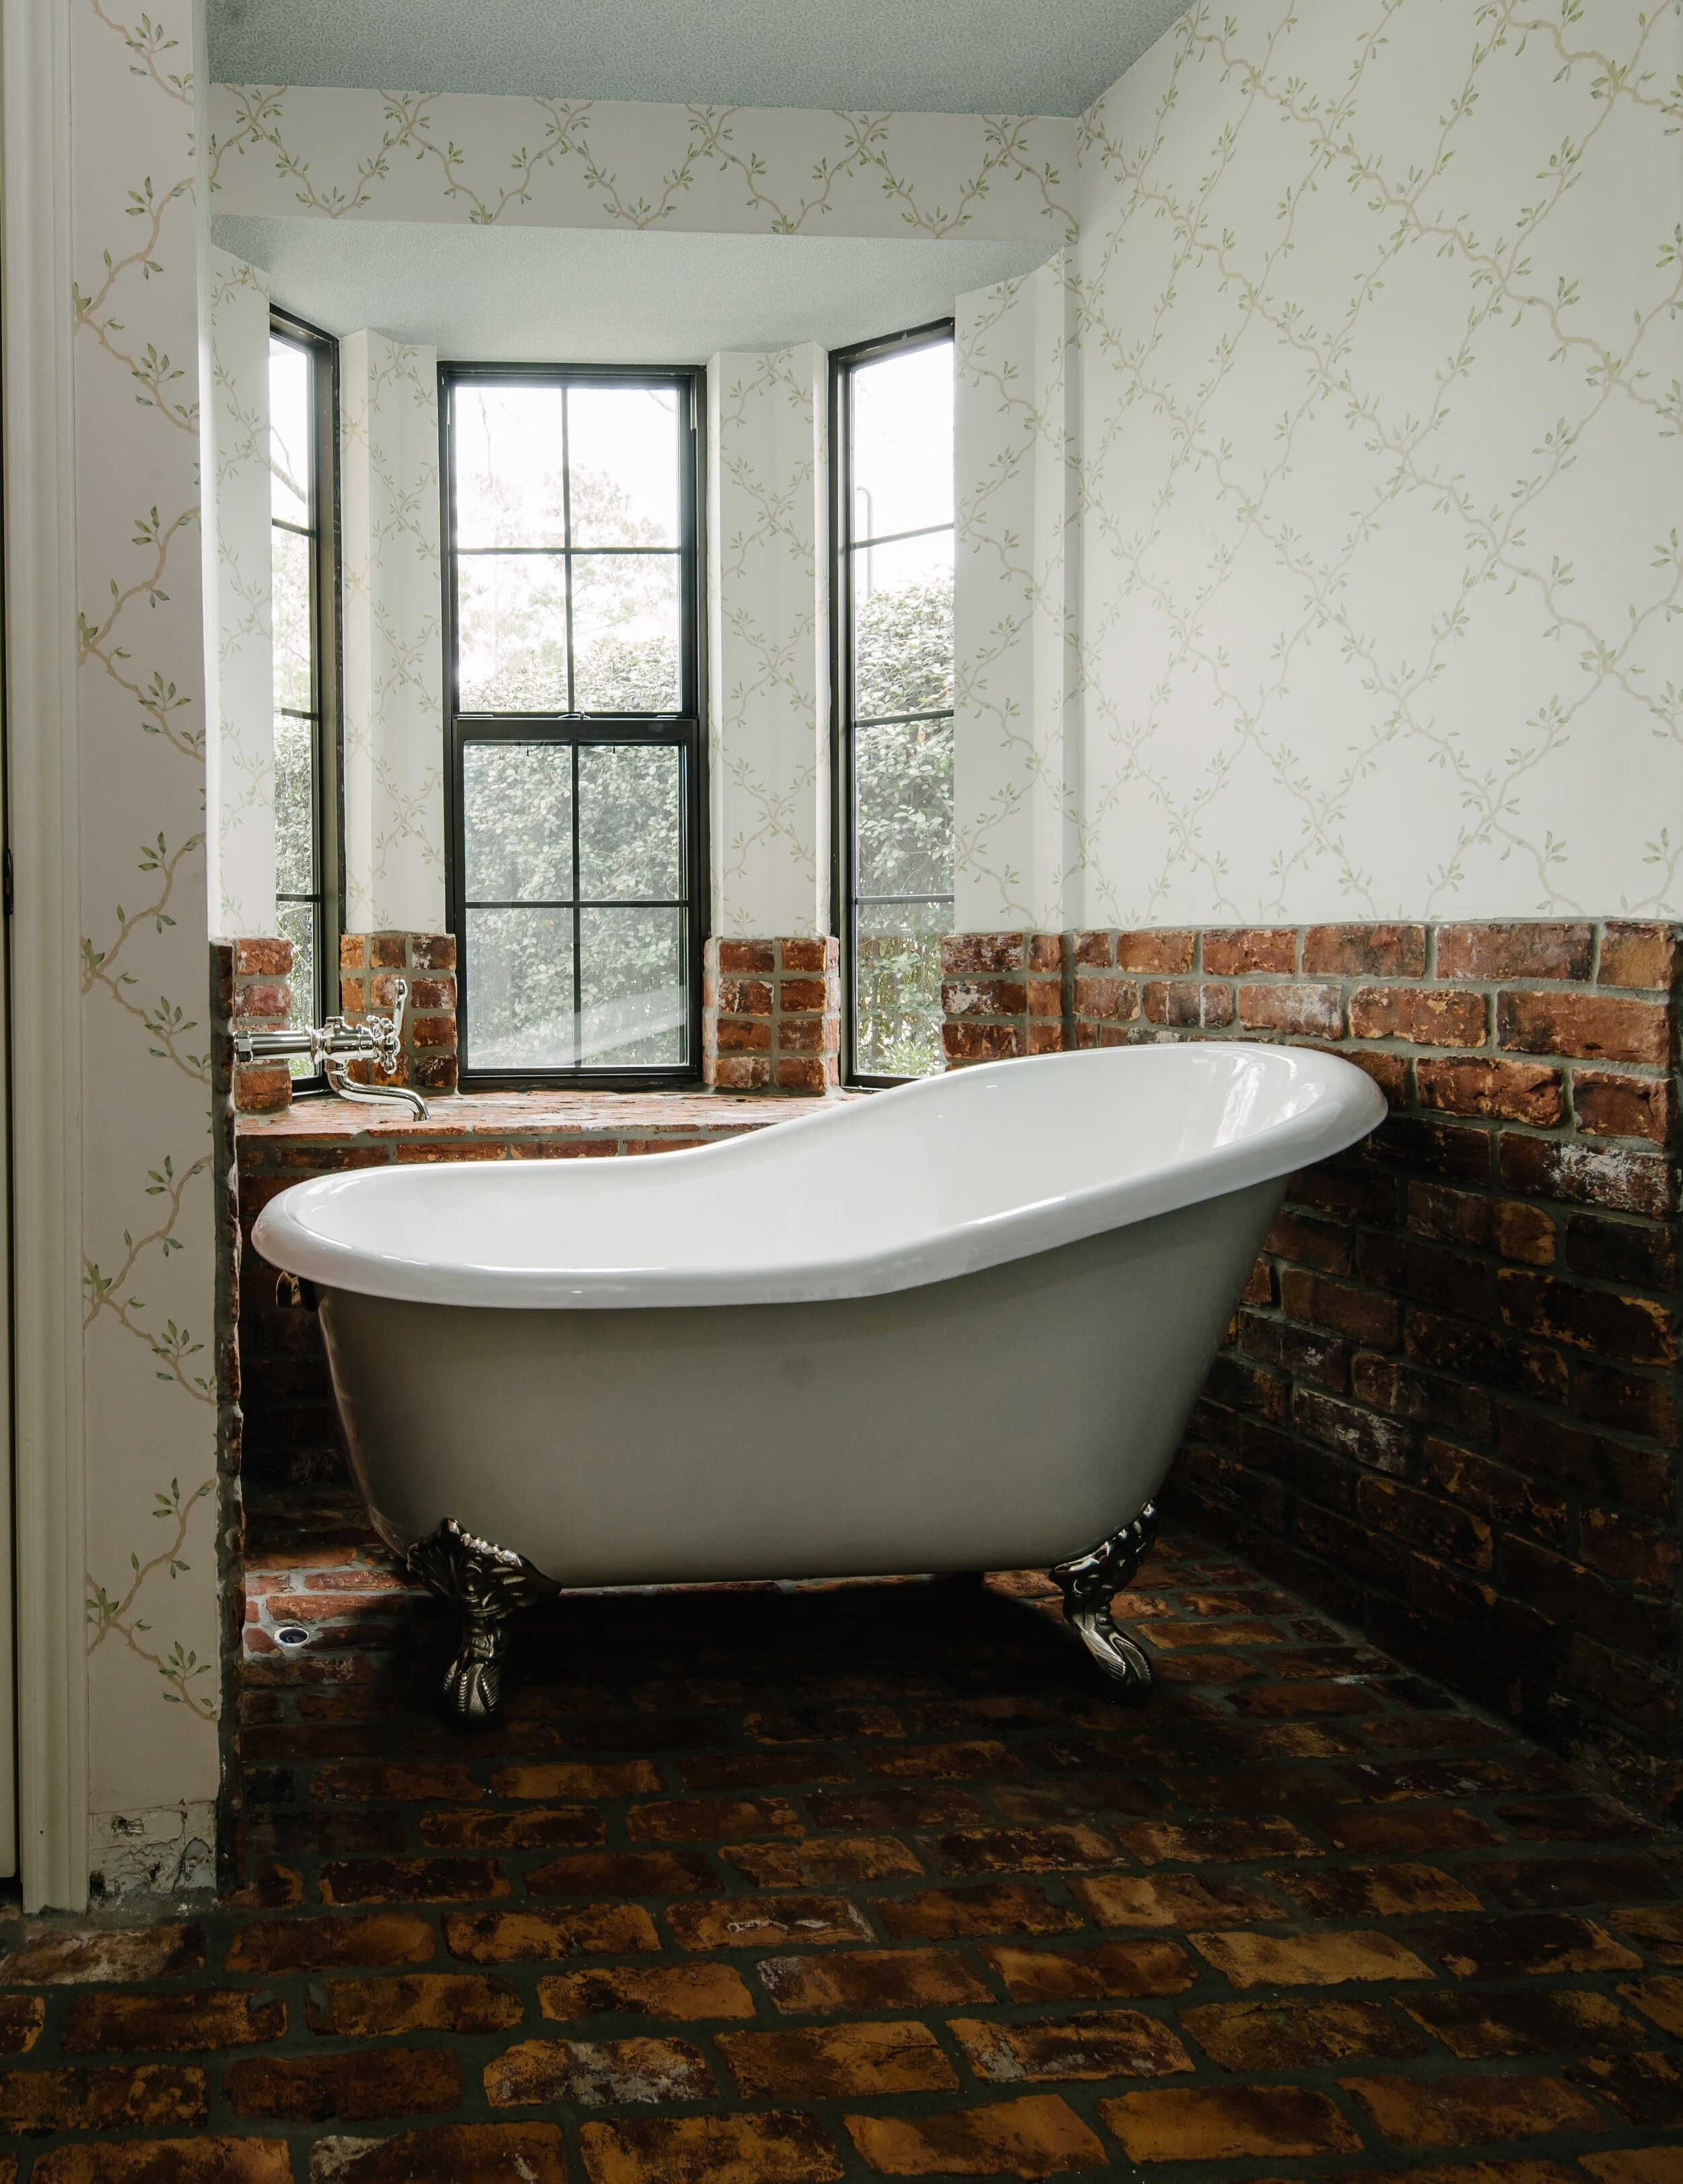 Full home renovations. Clawfoot bathtub, rustic brick flooring and brick accent wall. Master bathroom renovation, kitchen renovation, new oak wood flooring, painting, new fence, outdoor patio.